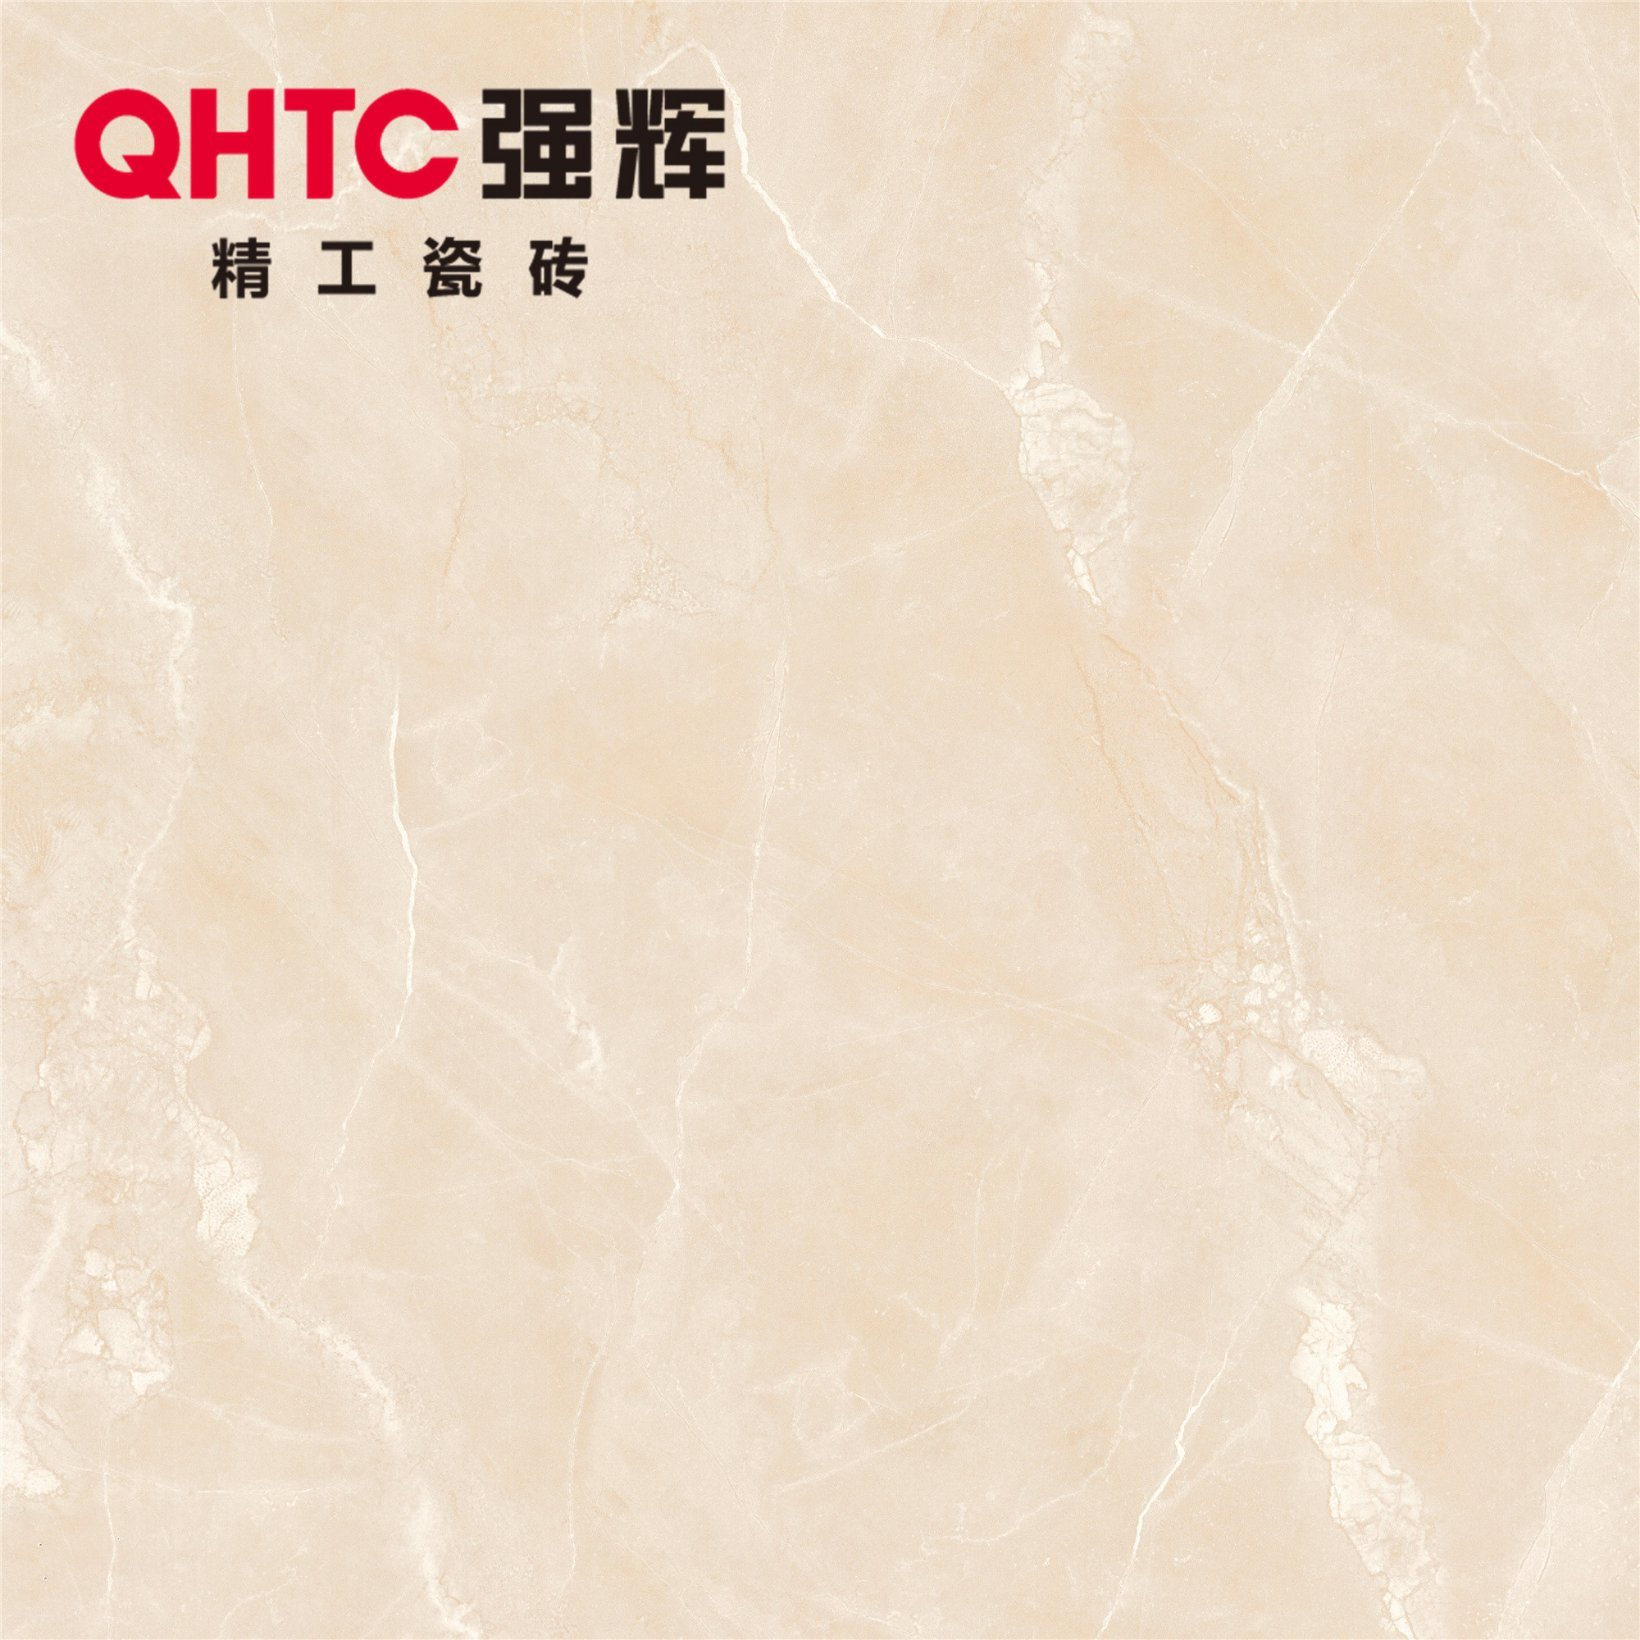 China Ceramic Marble Hall Flooring Tile Design 800x800mm Spanish Ceramic Floor Tiles Price China Building Material Porcelain Tiles